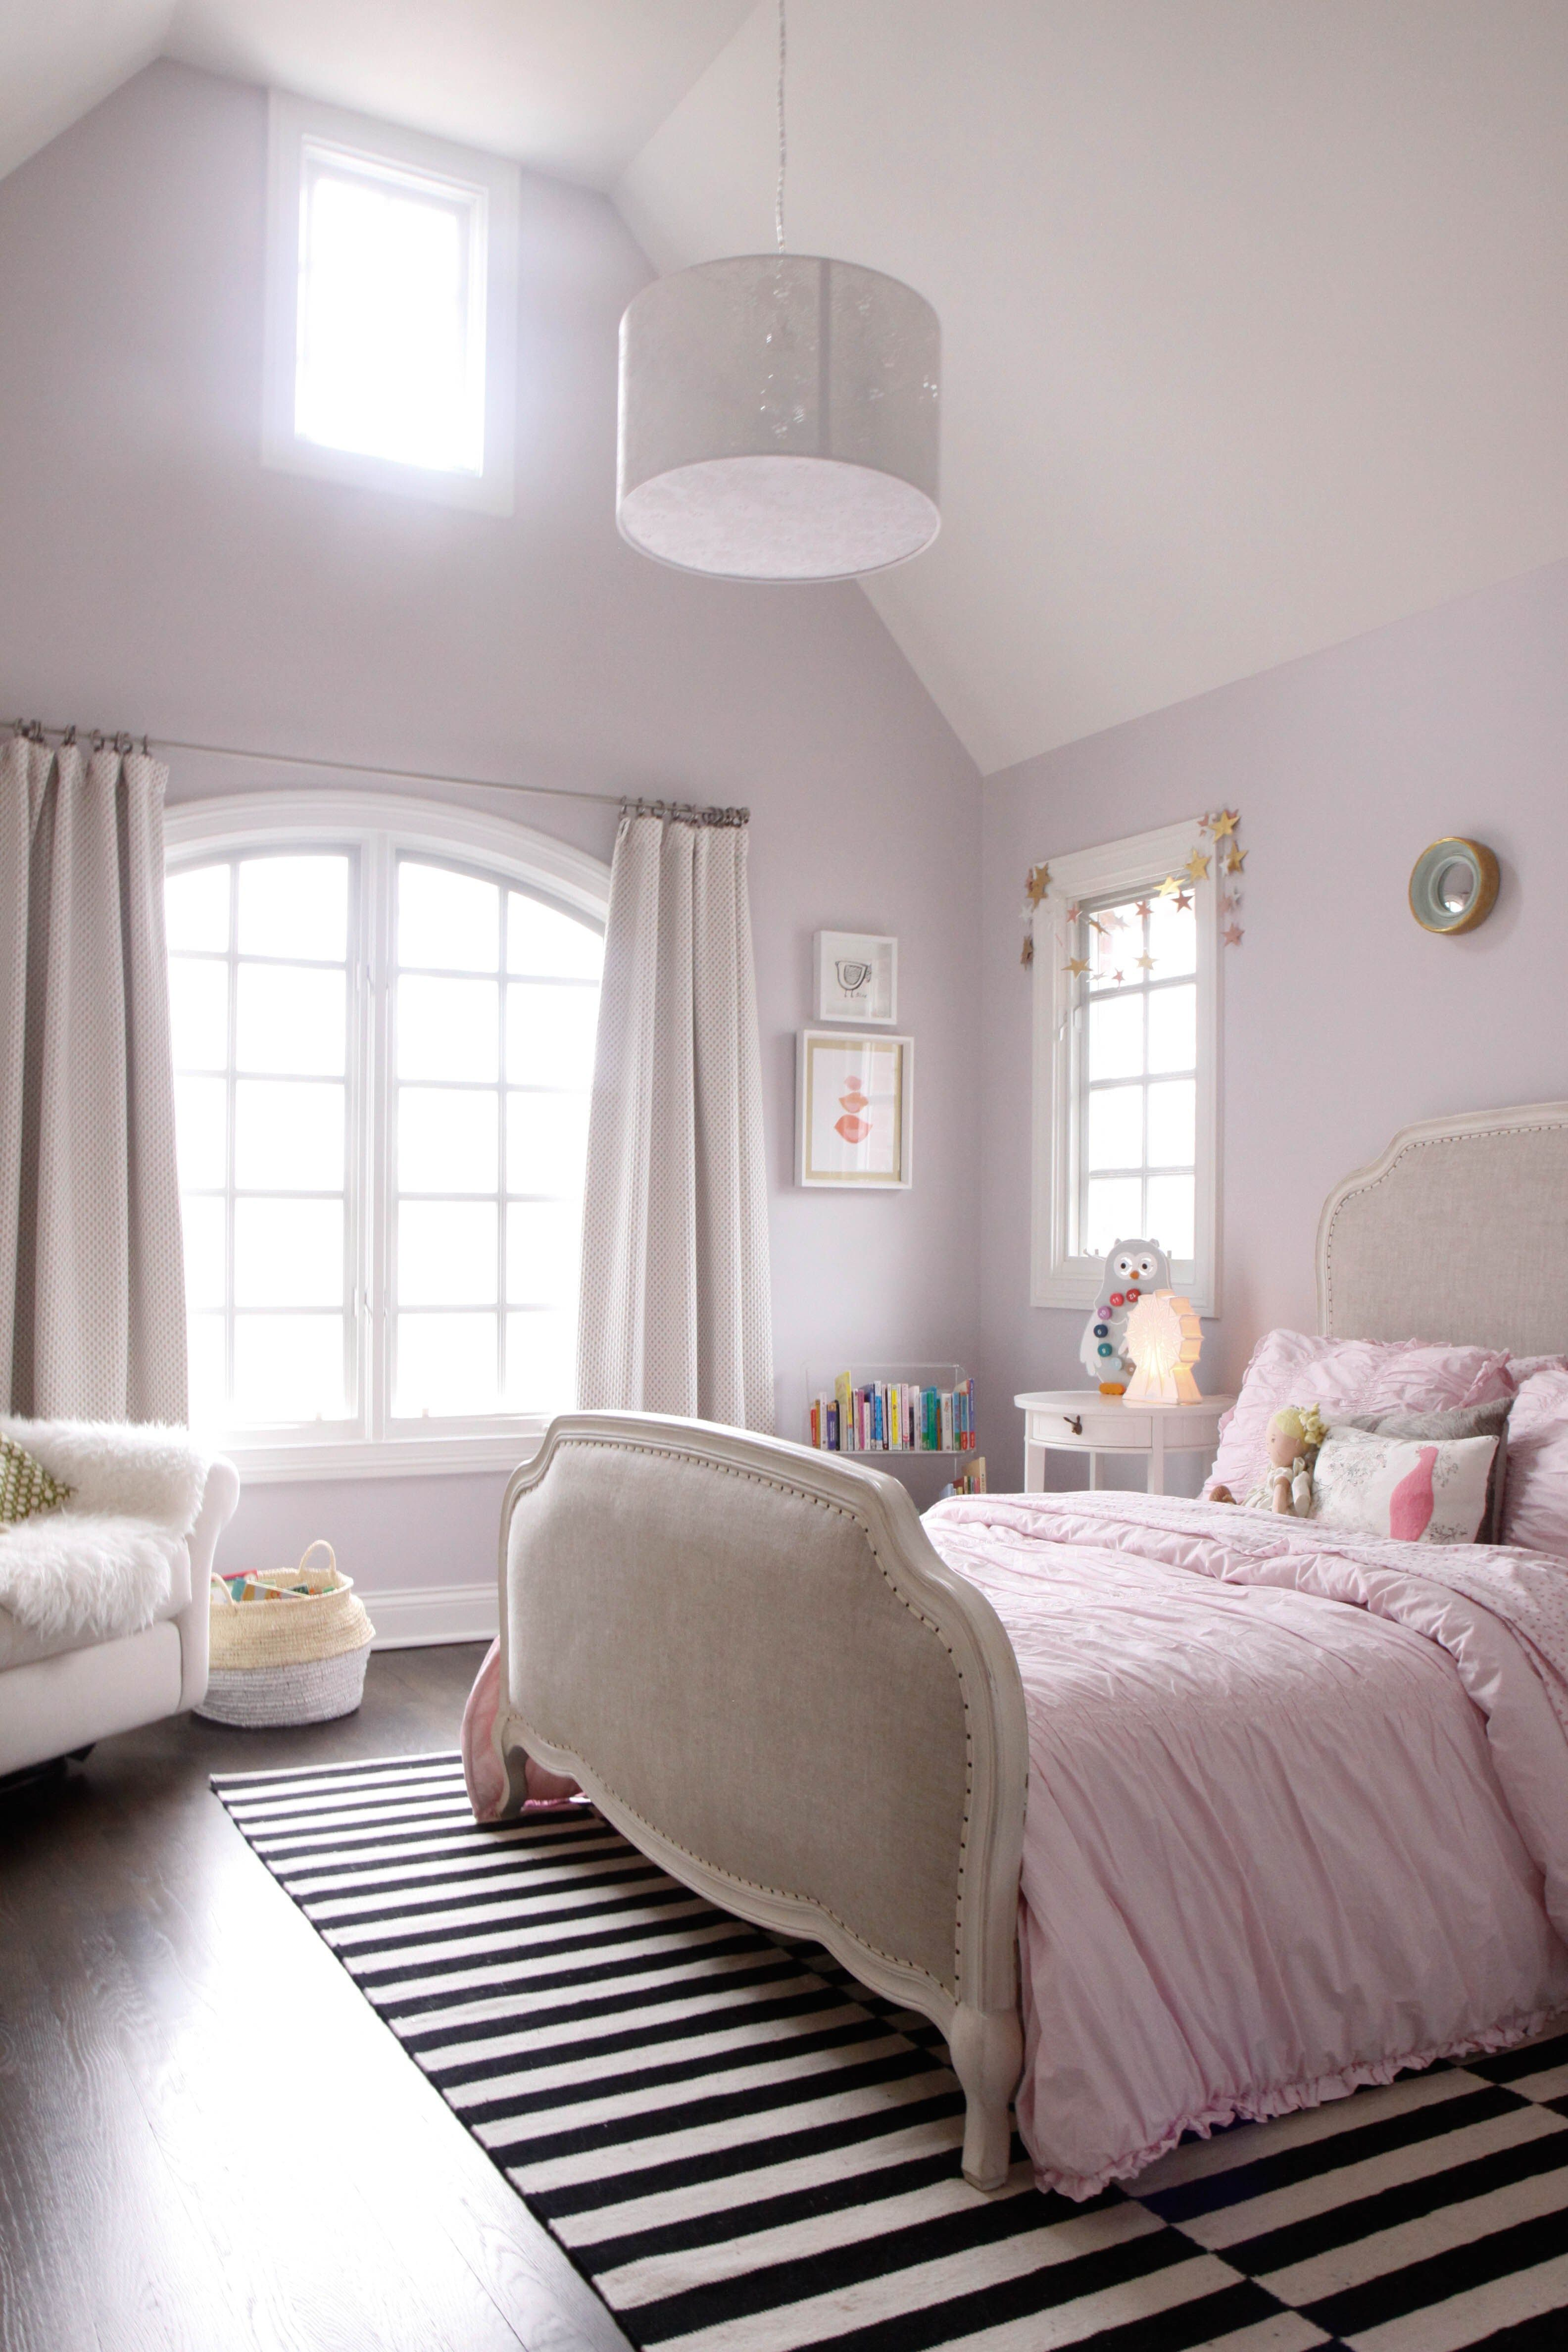 A Whimsical Little Girl S Room Pink Bedroom Decor Pink Bedroom